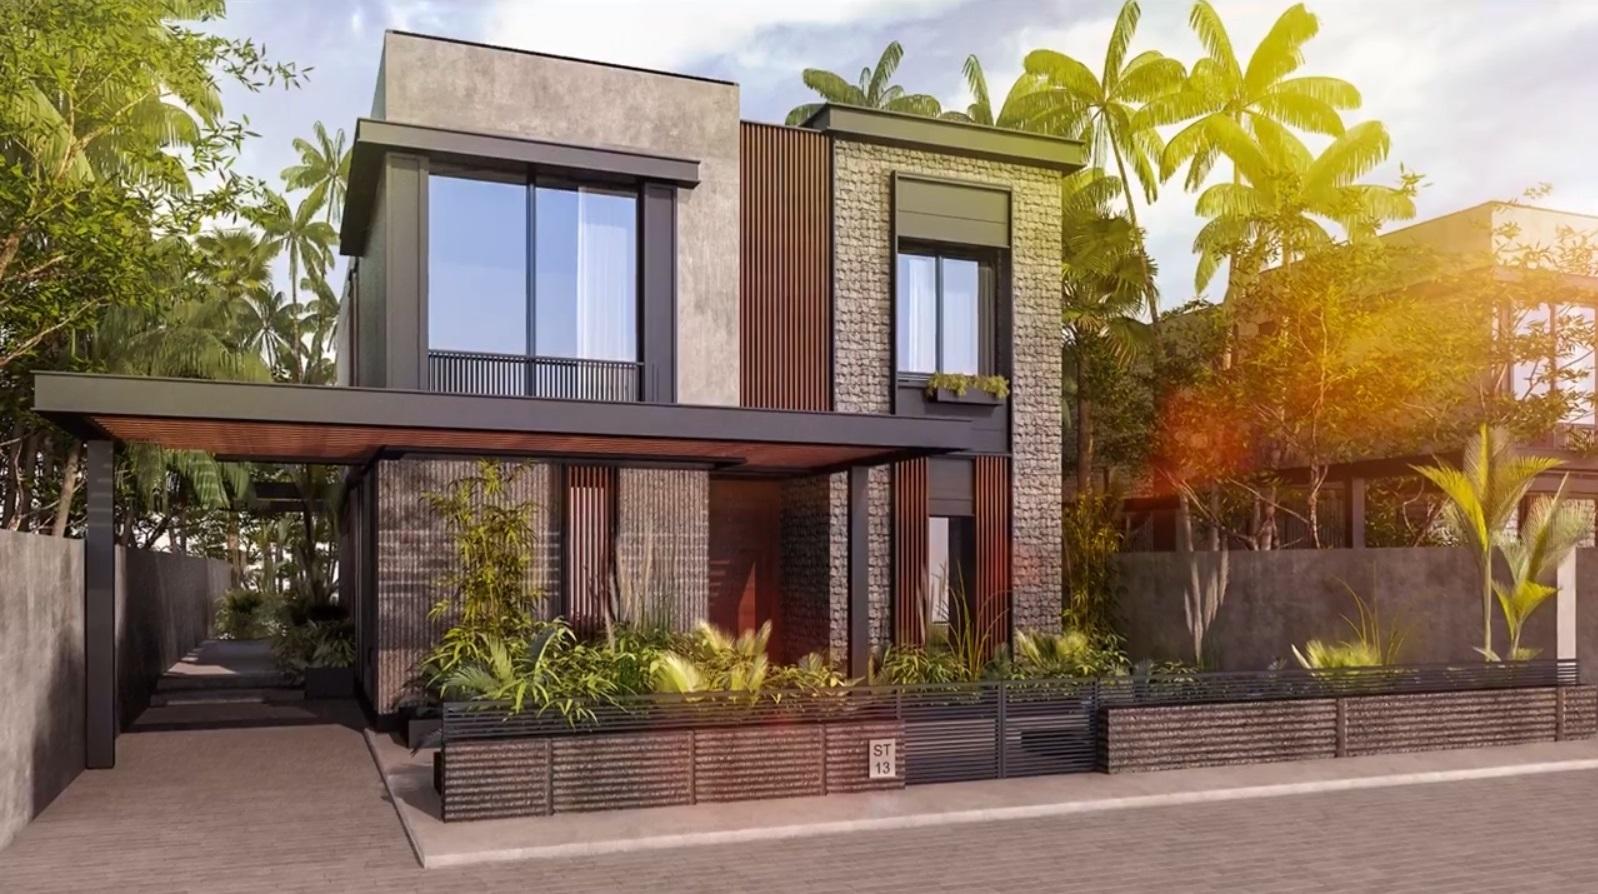 Villas-in-HapTown